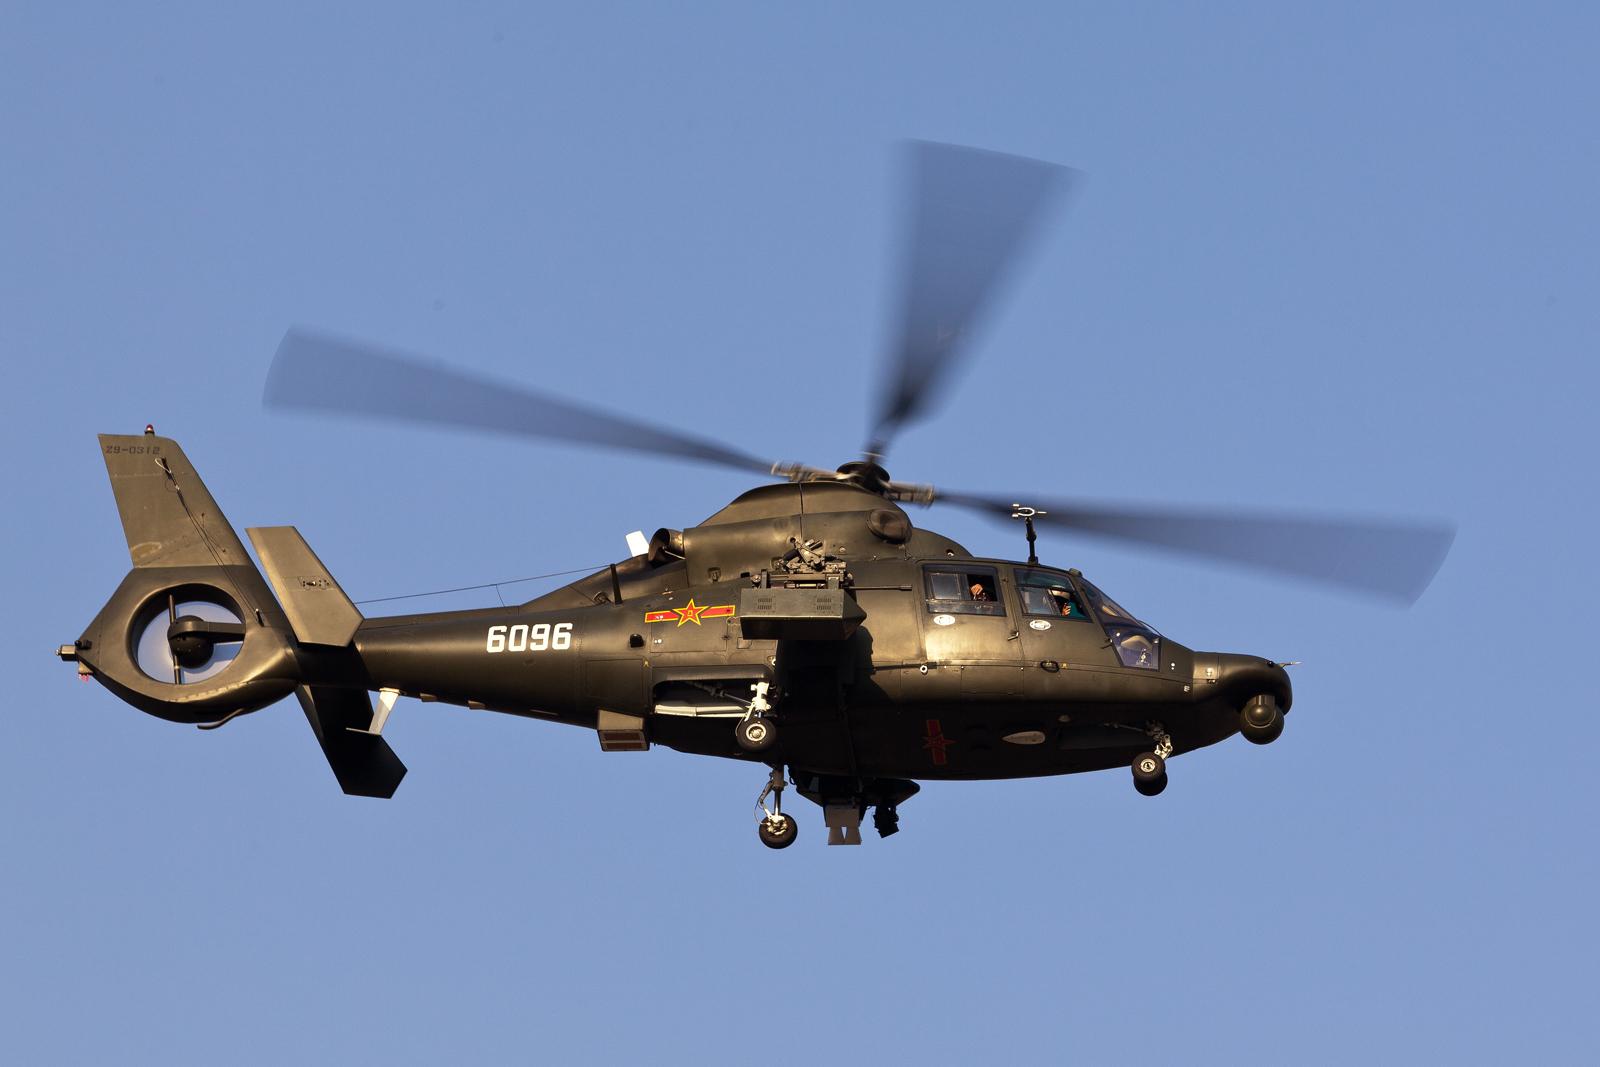 批il�.��/n�/n�nl���9��9l!9g*9�[��_武直9_ch-47支奴干中型运输直升机